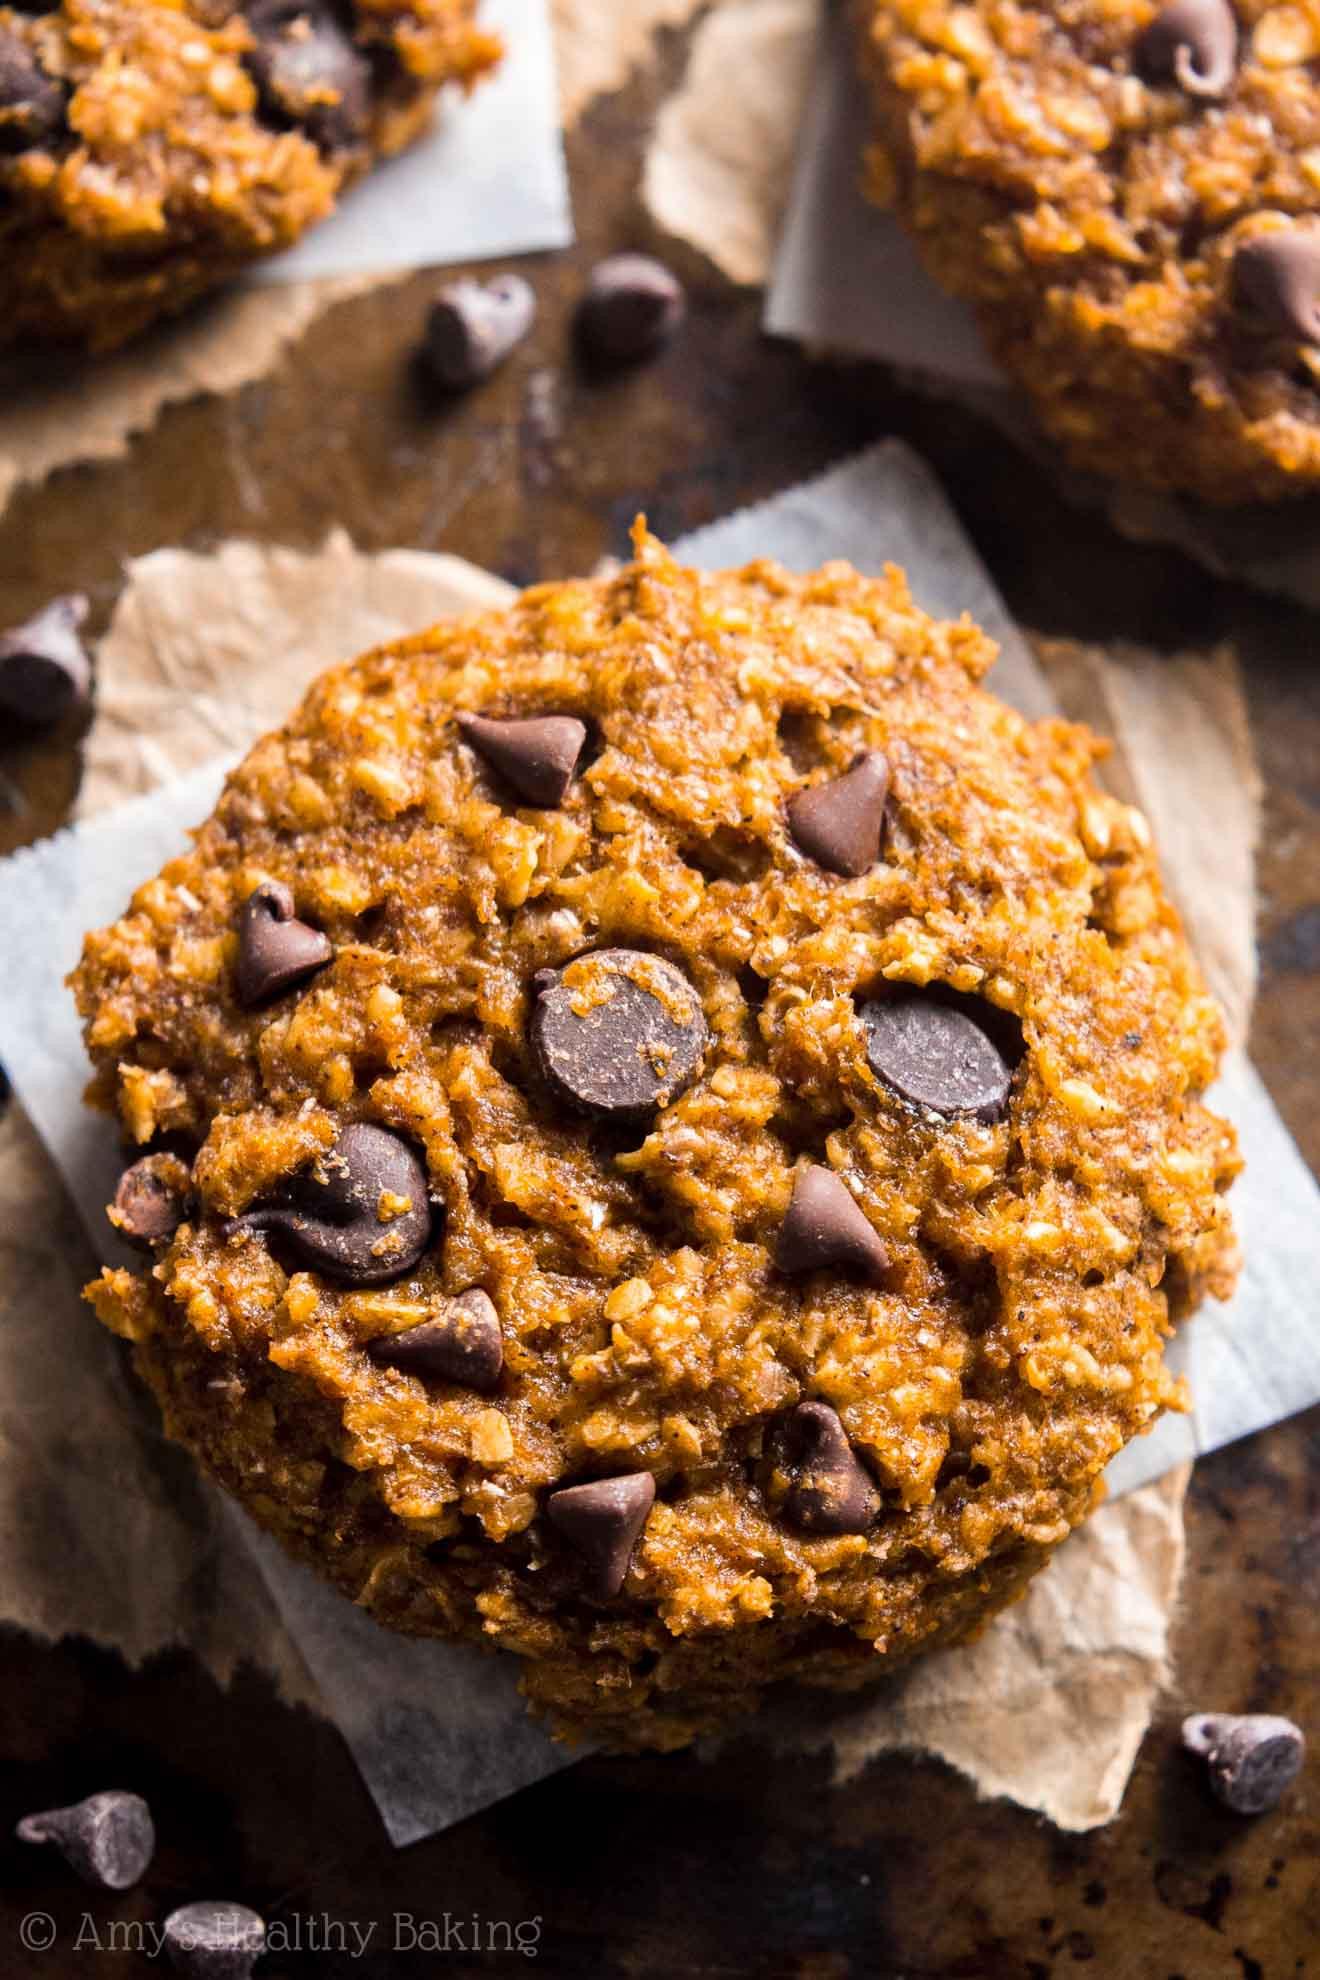 Healthy Pumpkin Oatmeal Chocolate Chip Cookies  Pumpkin Pie Chocolate Chip Oatmeal Cookies Recipe Video